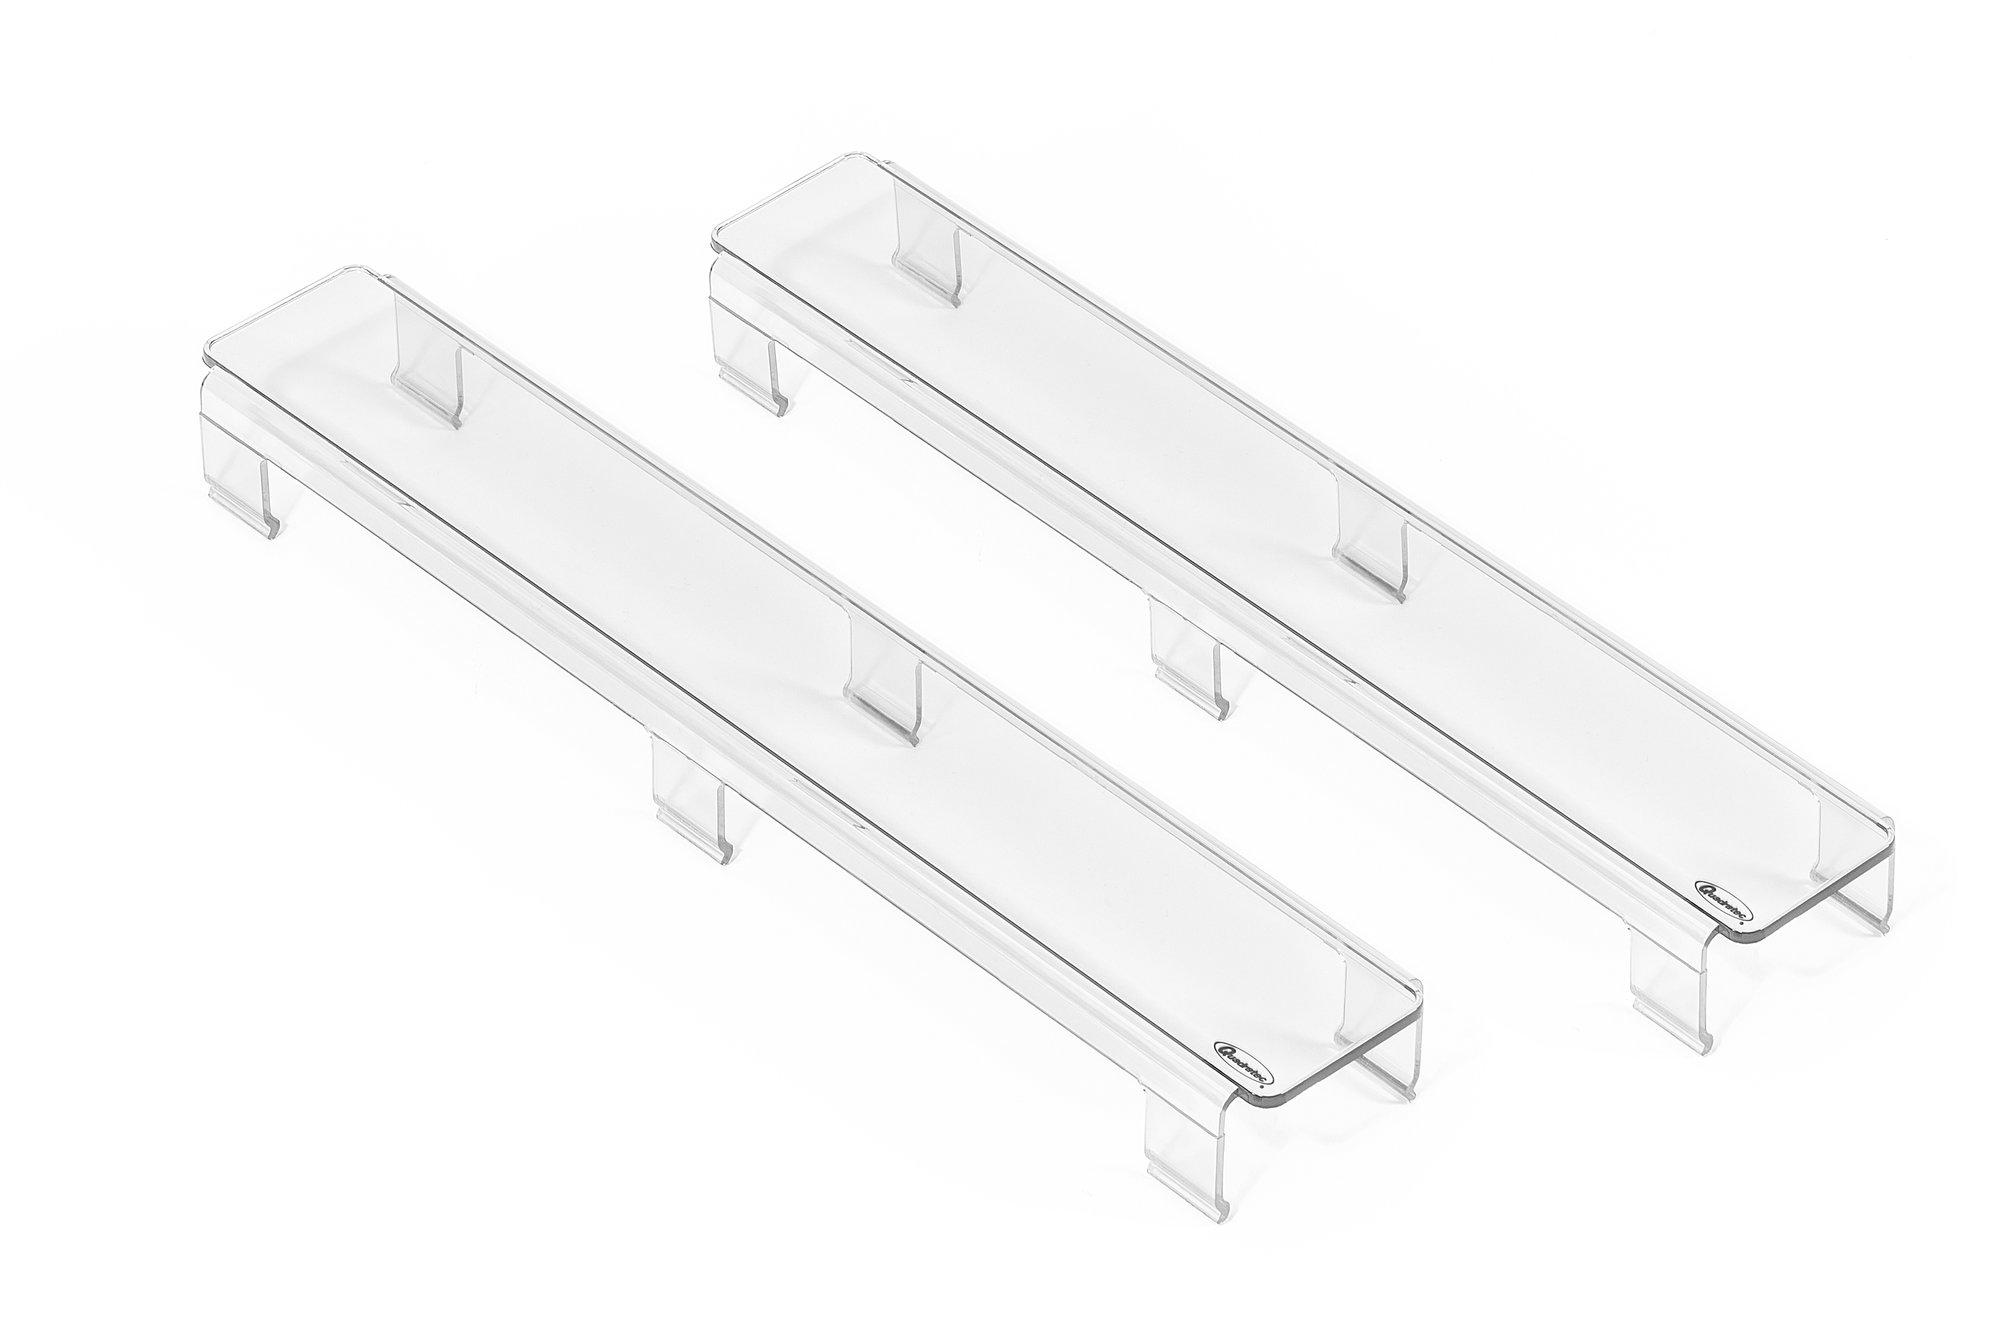 Quadratec Light Covers For 26 Led Light Bar